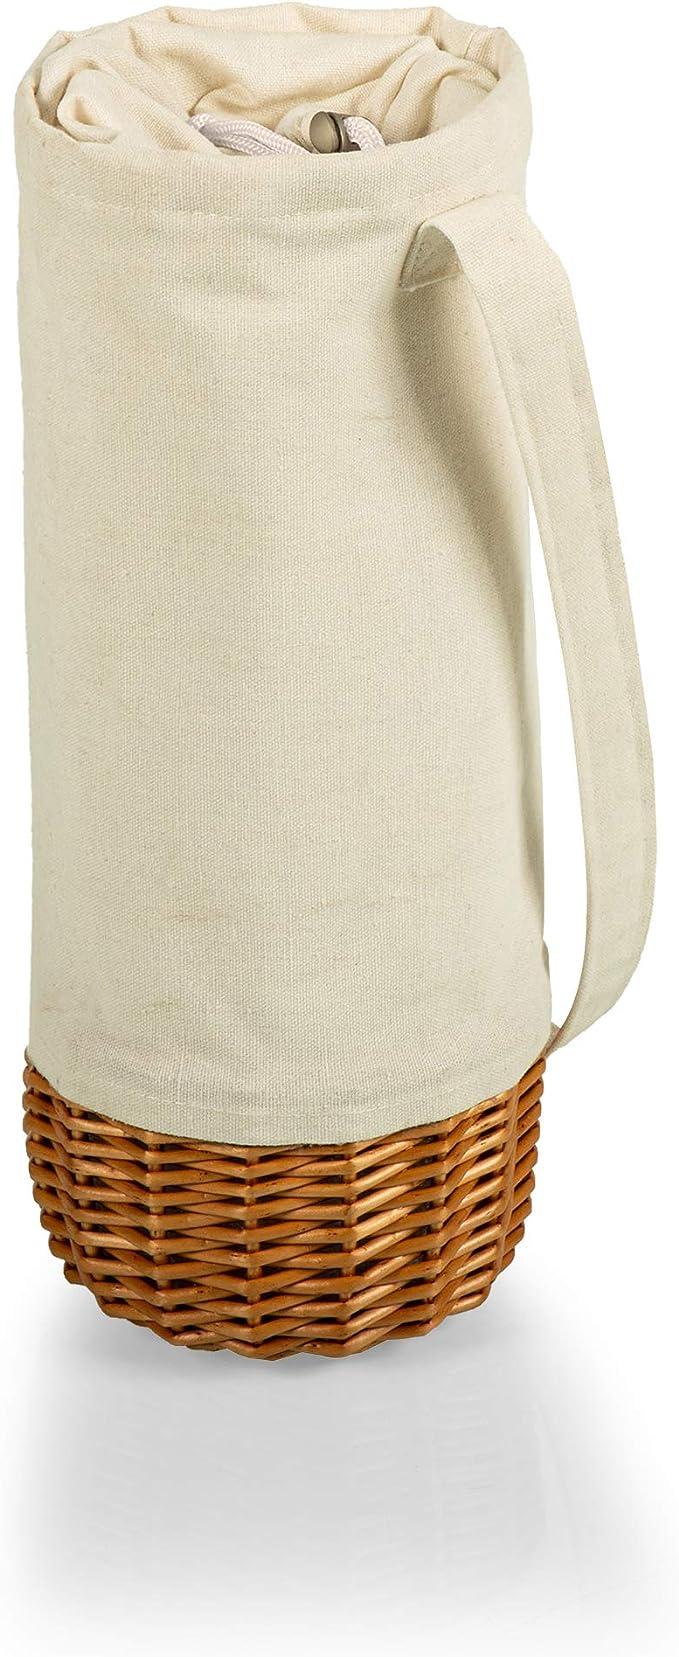 Trendsetter Incanto Yarn  Color 26 Wine Bucket